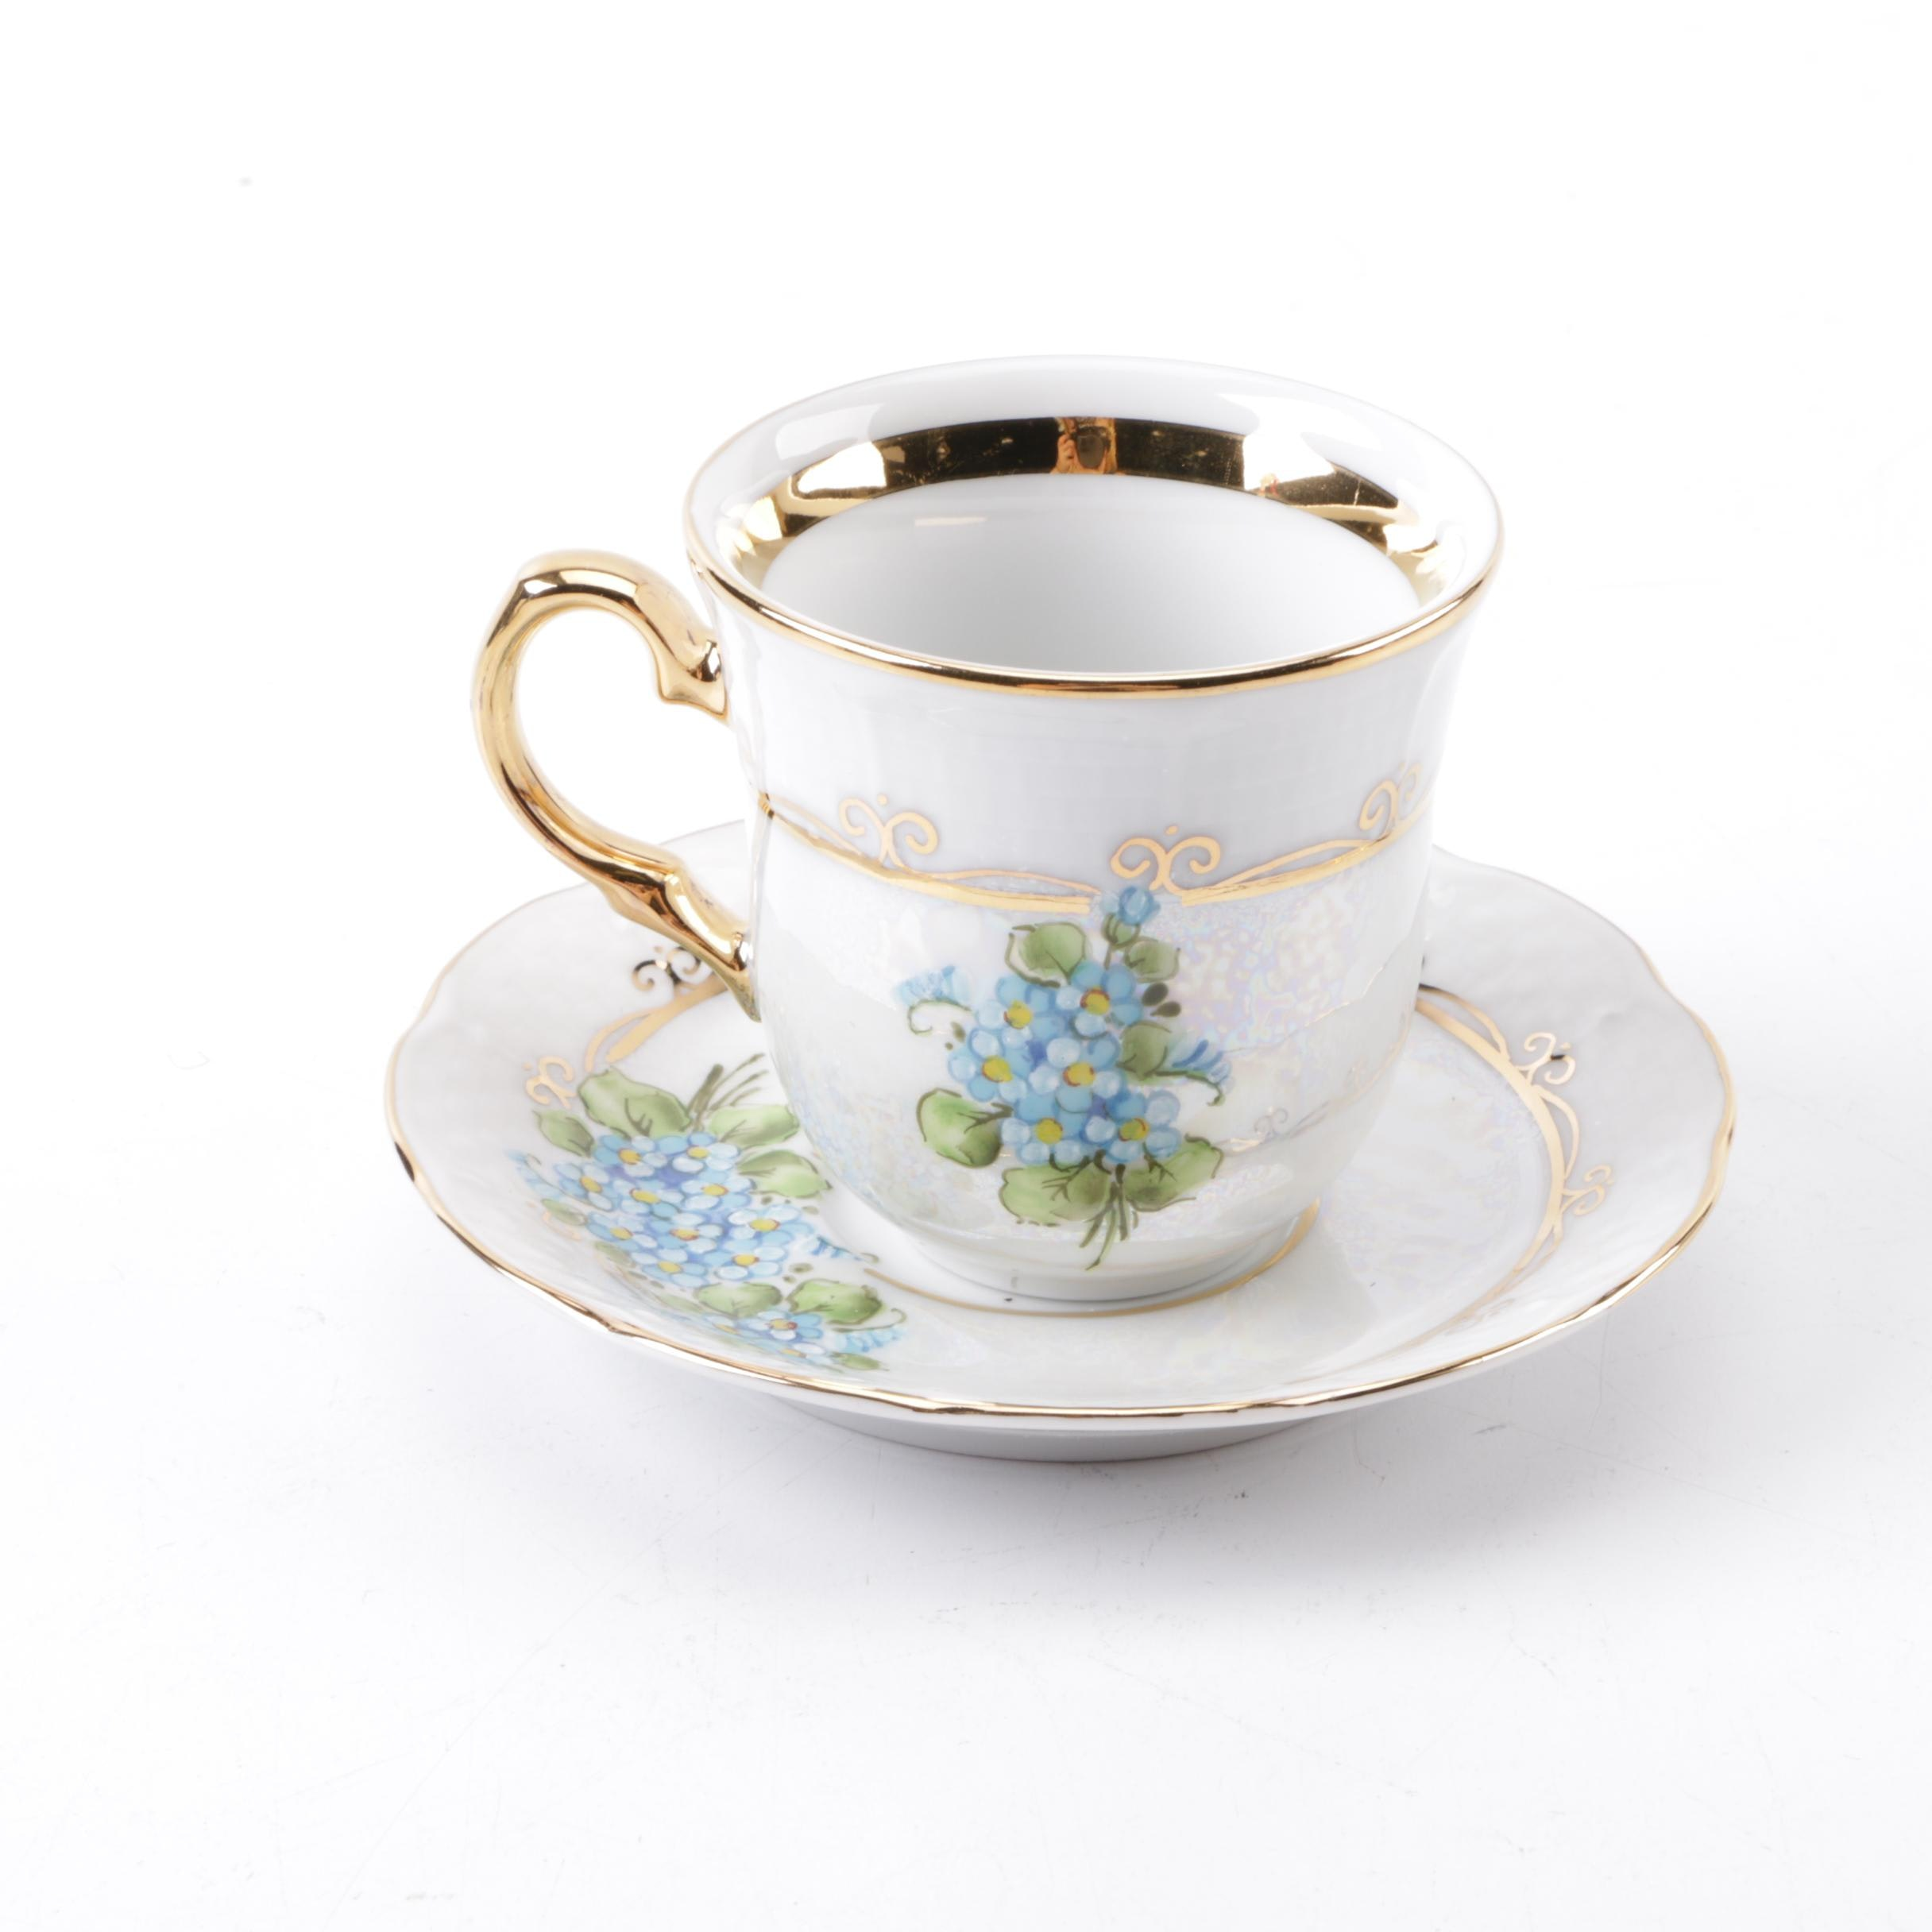 Vintage Thun Czech Republic Tea Cup